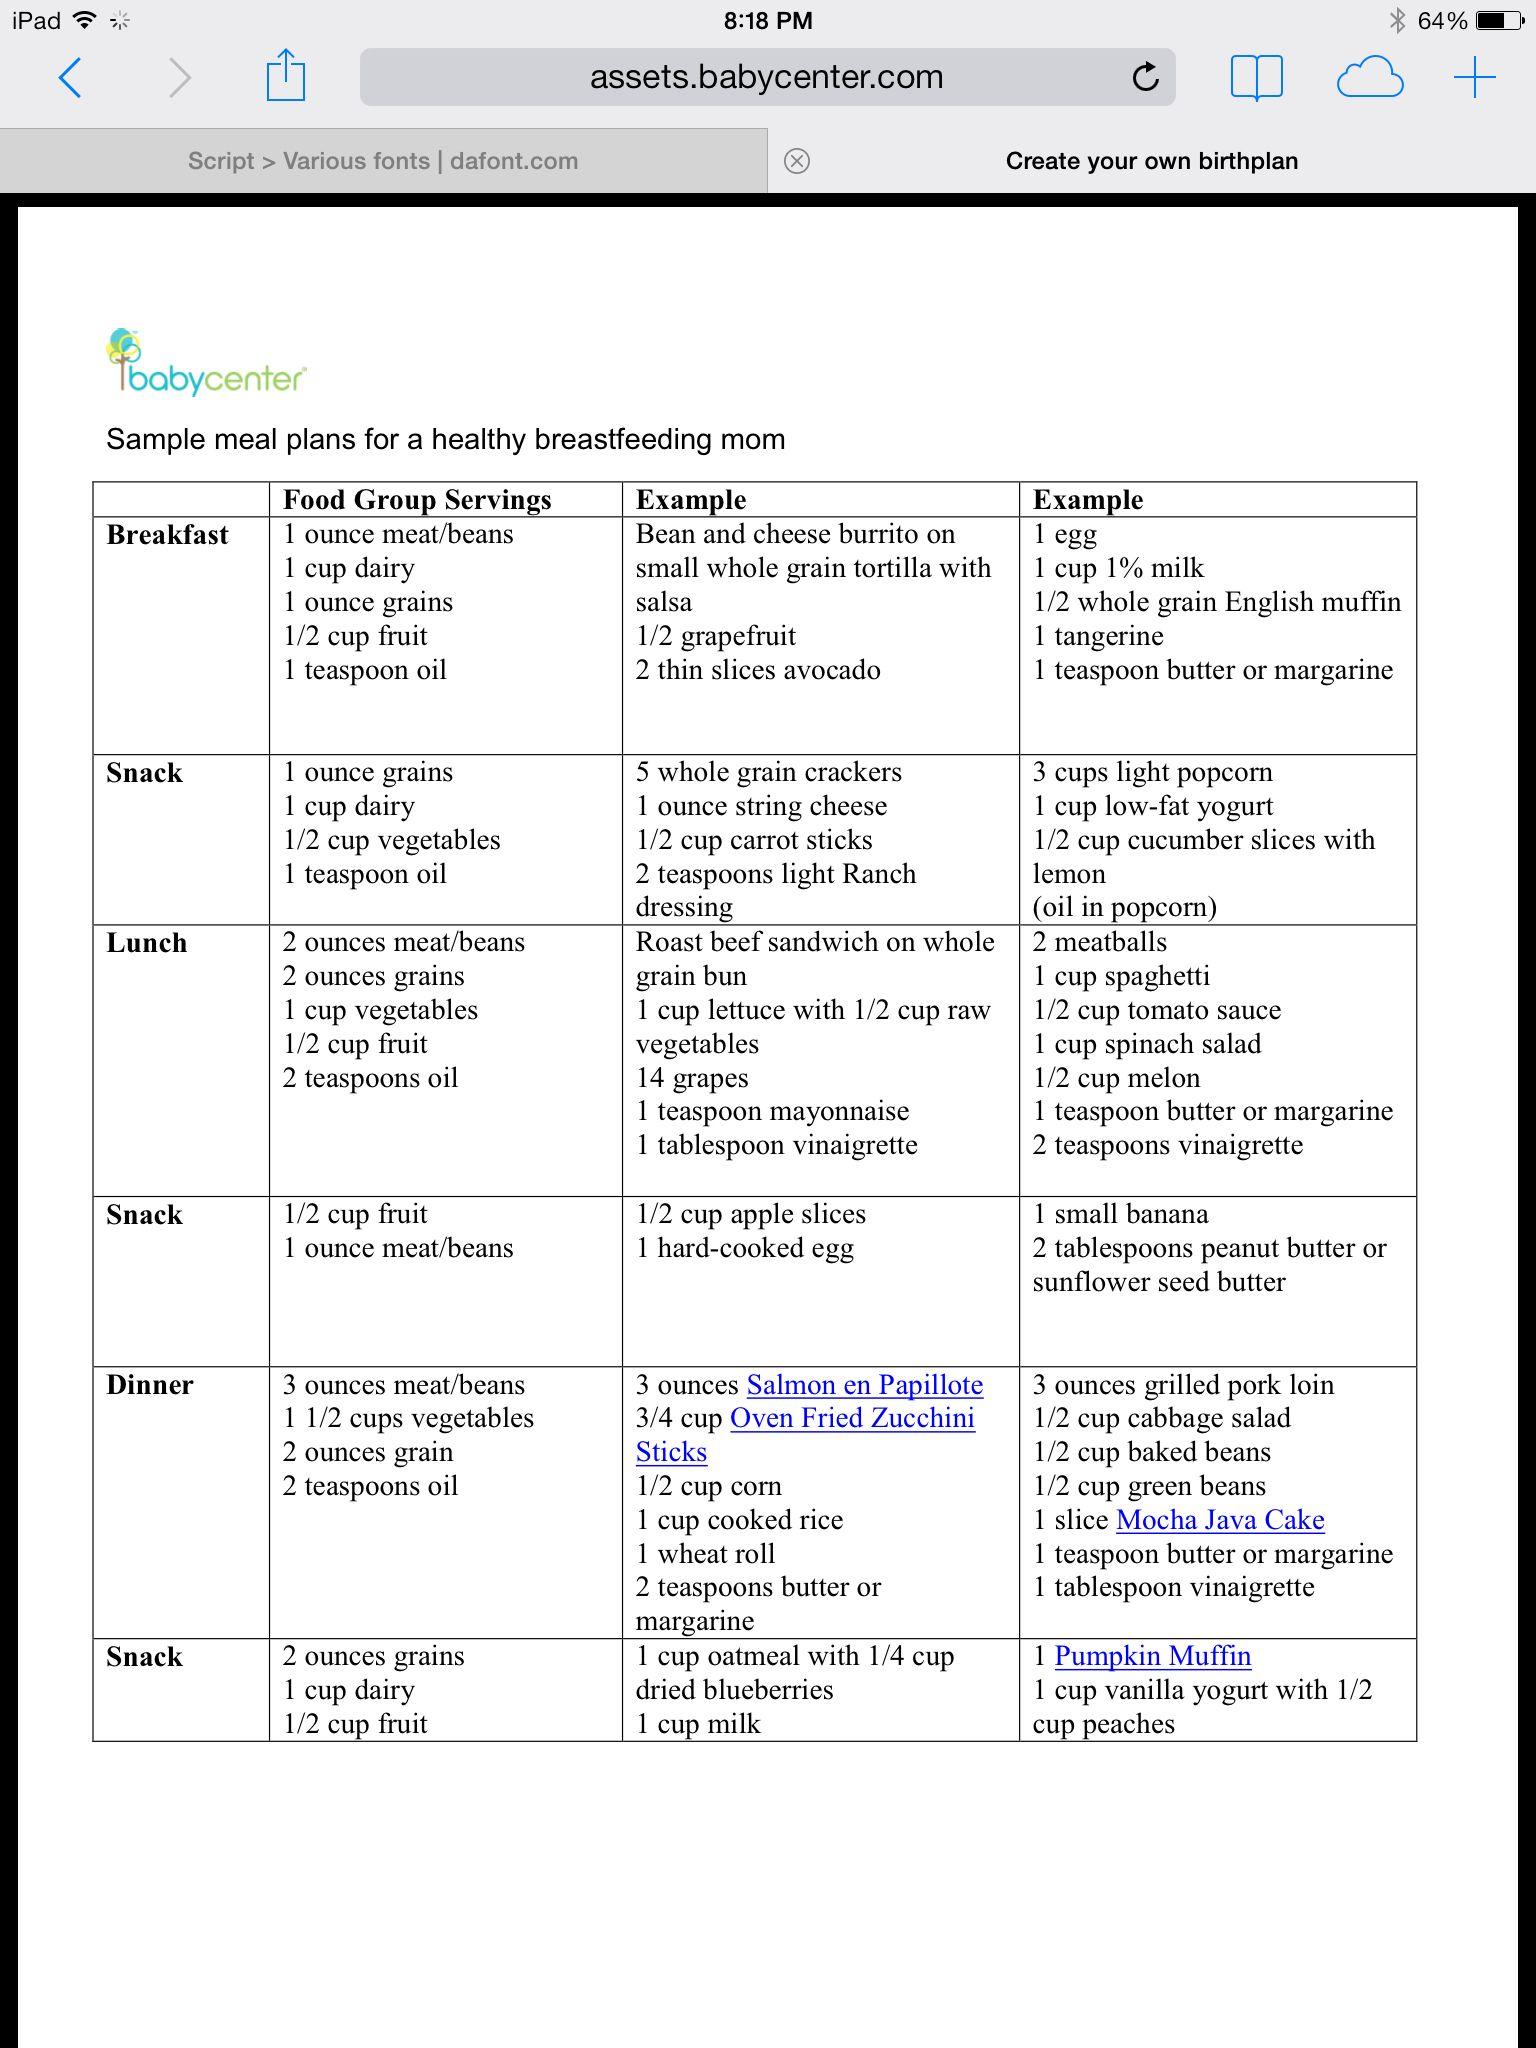 Sample Meal Plan For Breastfeeding Moms